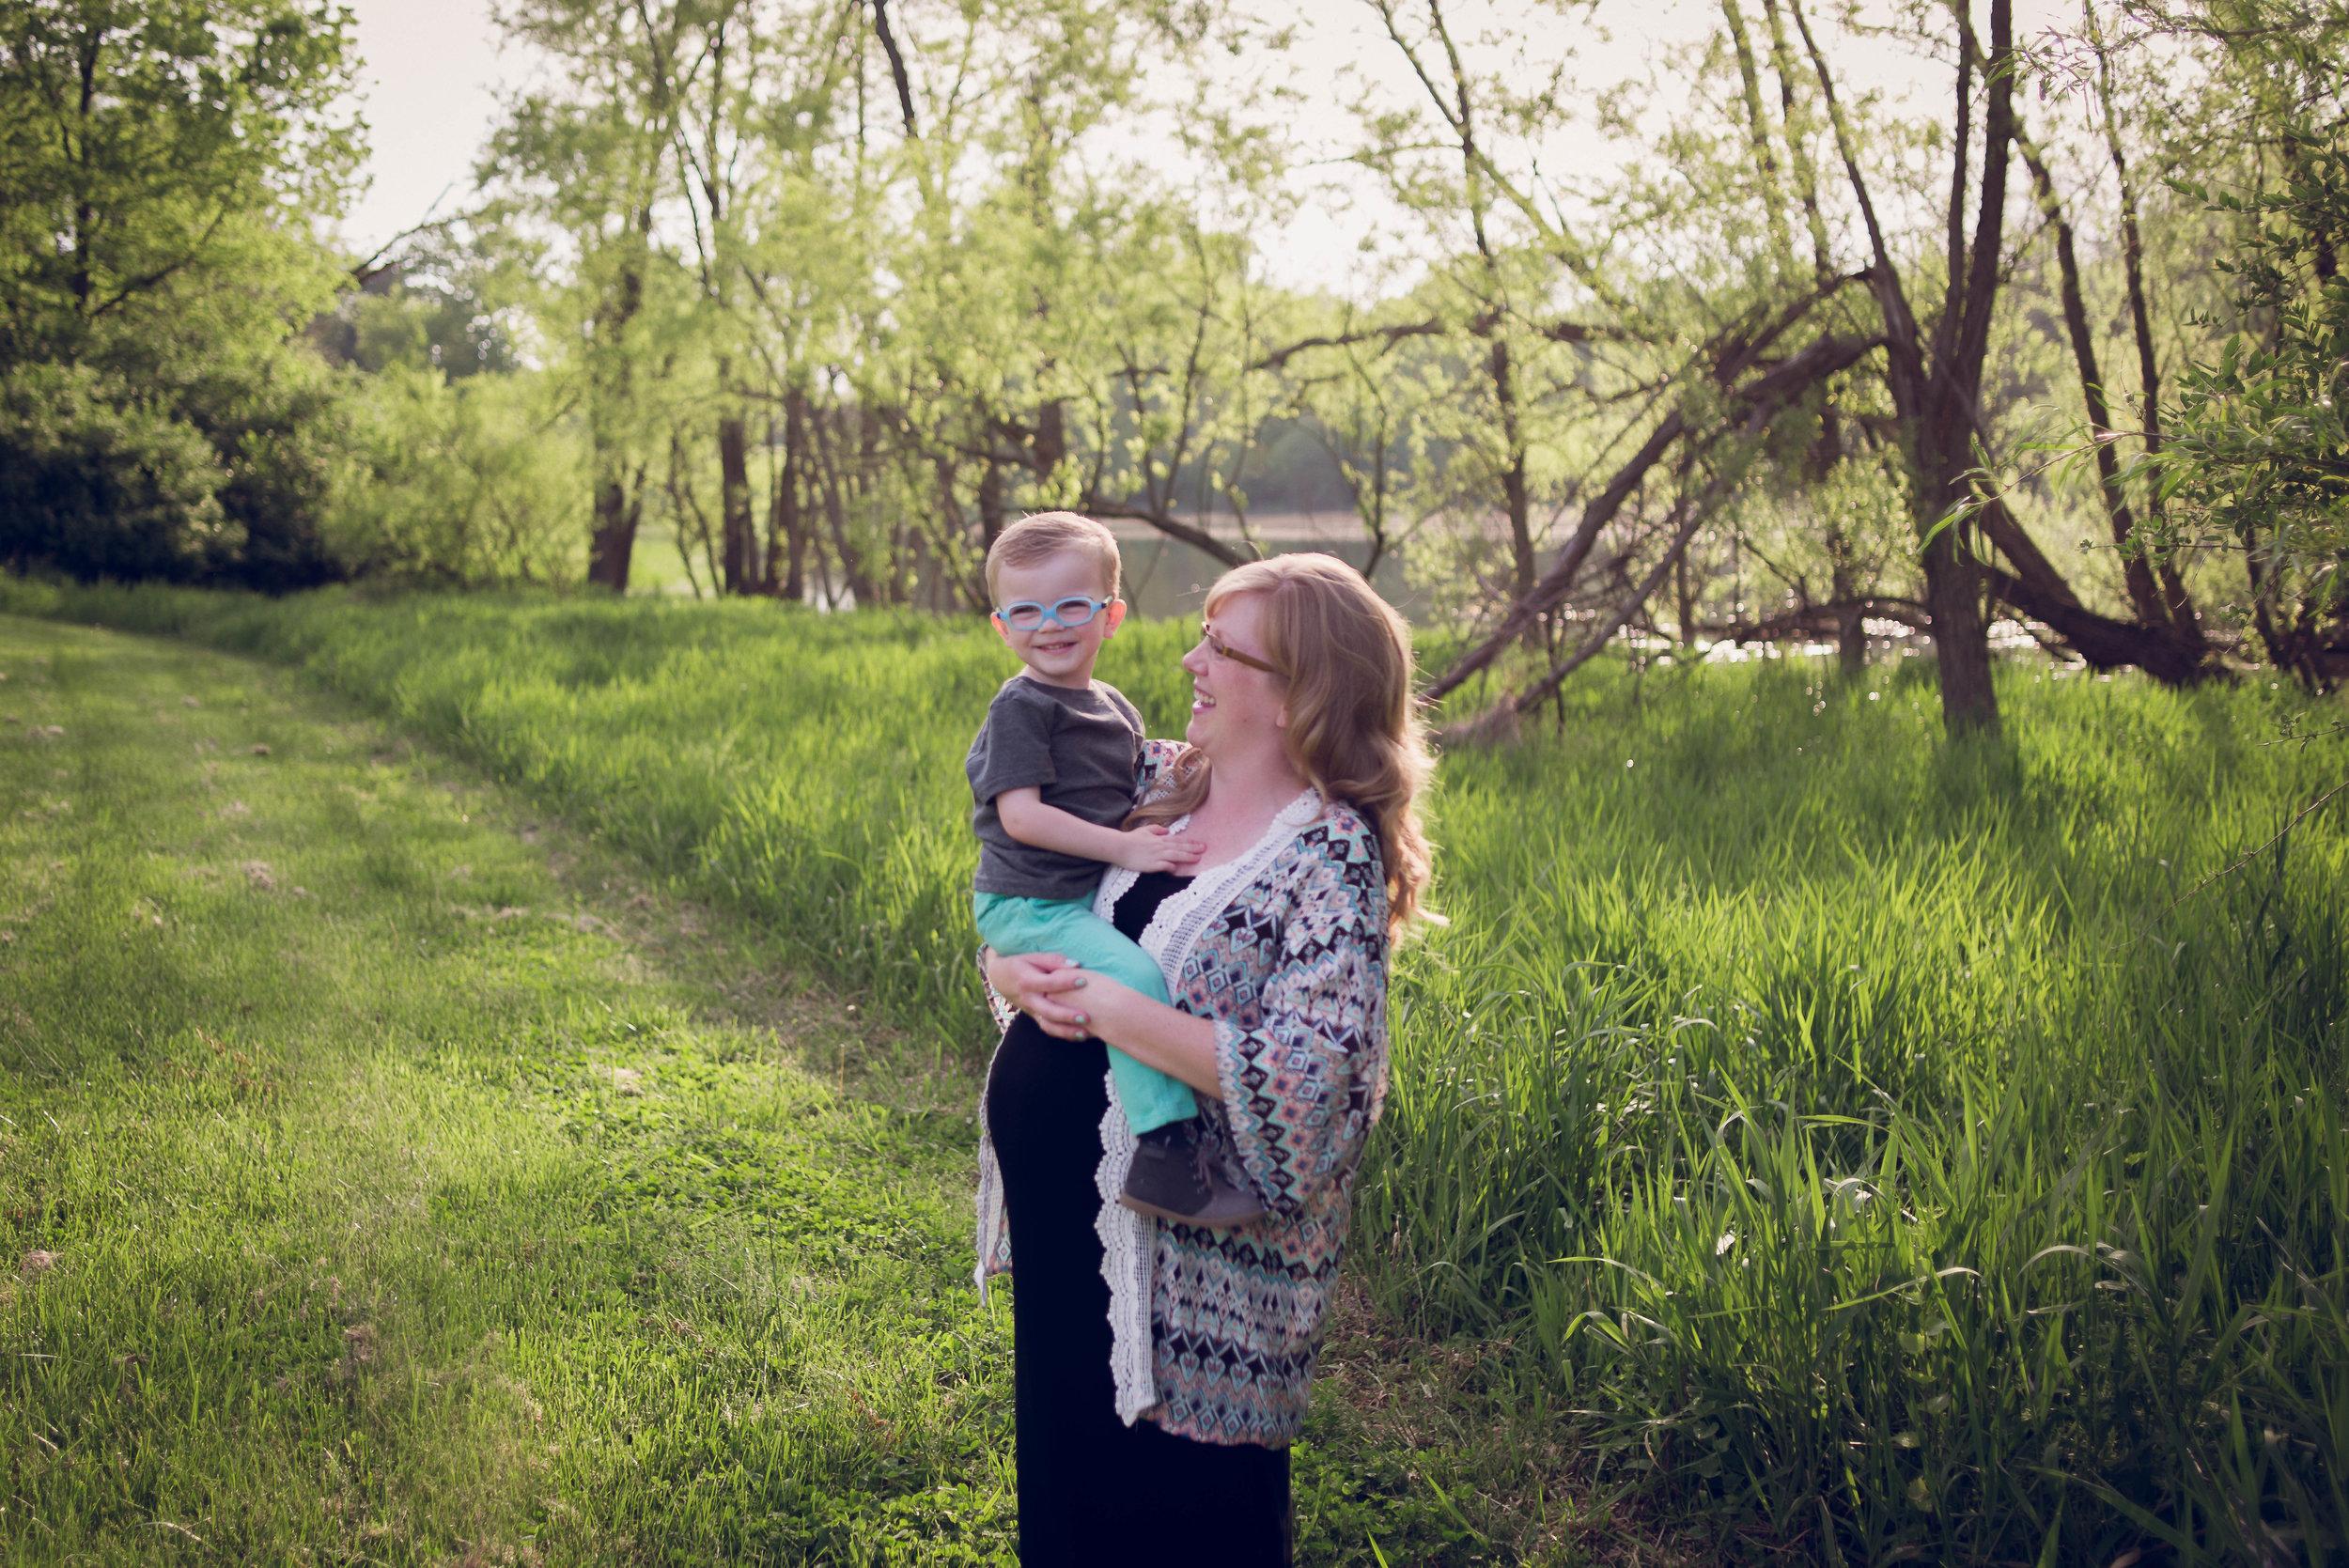 BrittneyHogue-MaternityPregnancyPhotographer-PeoriaIL-PekinIL-BloomingtonIL-5761.jpg